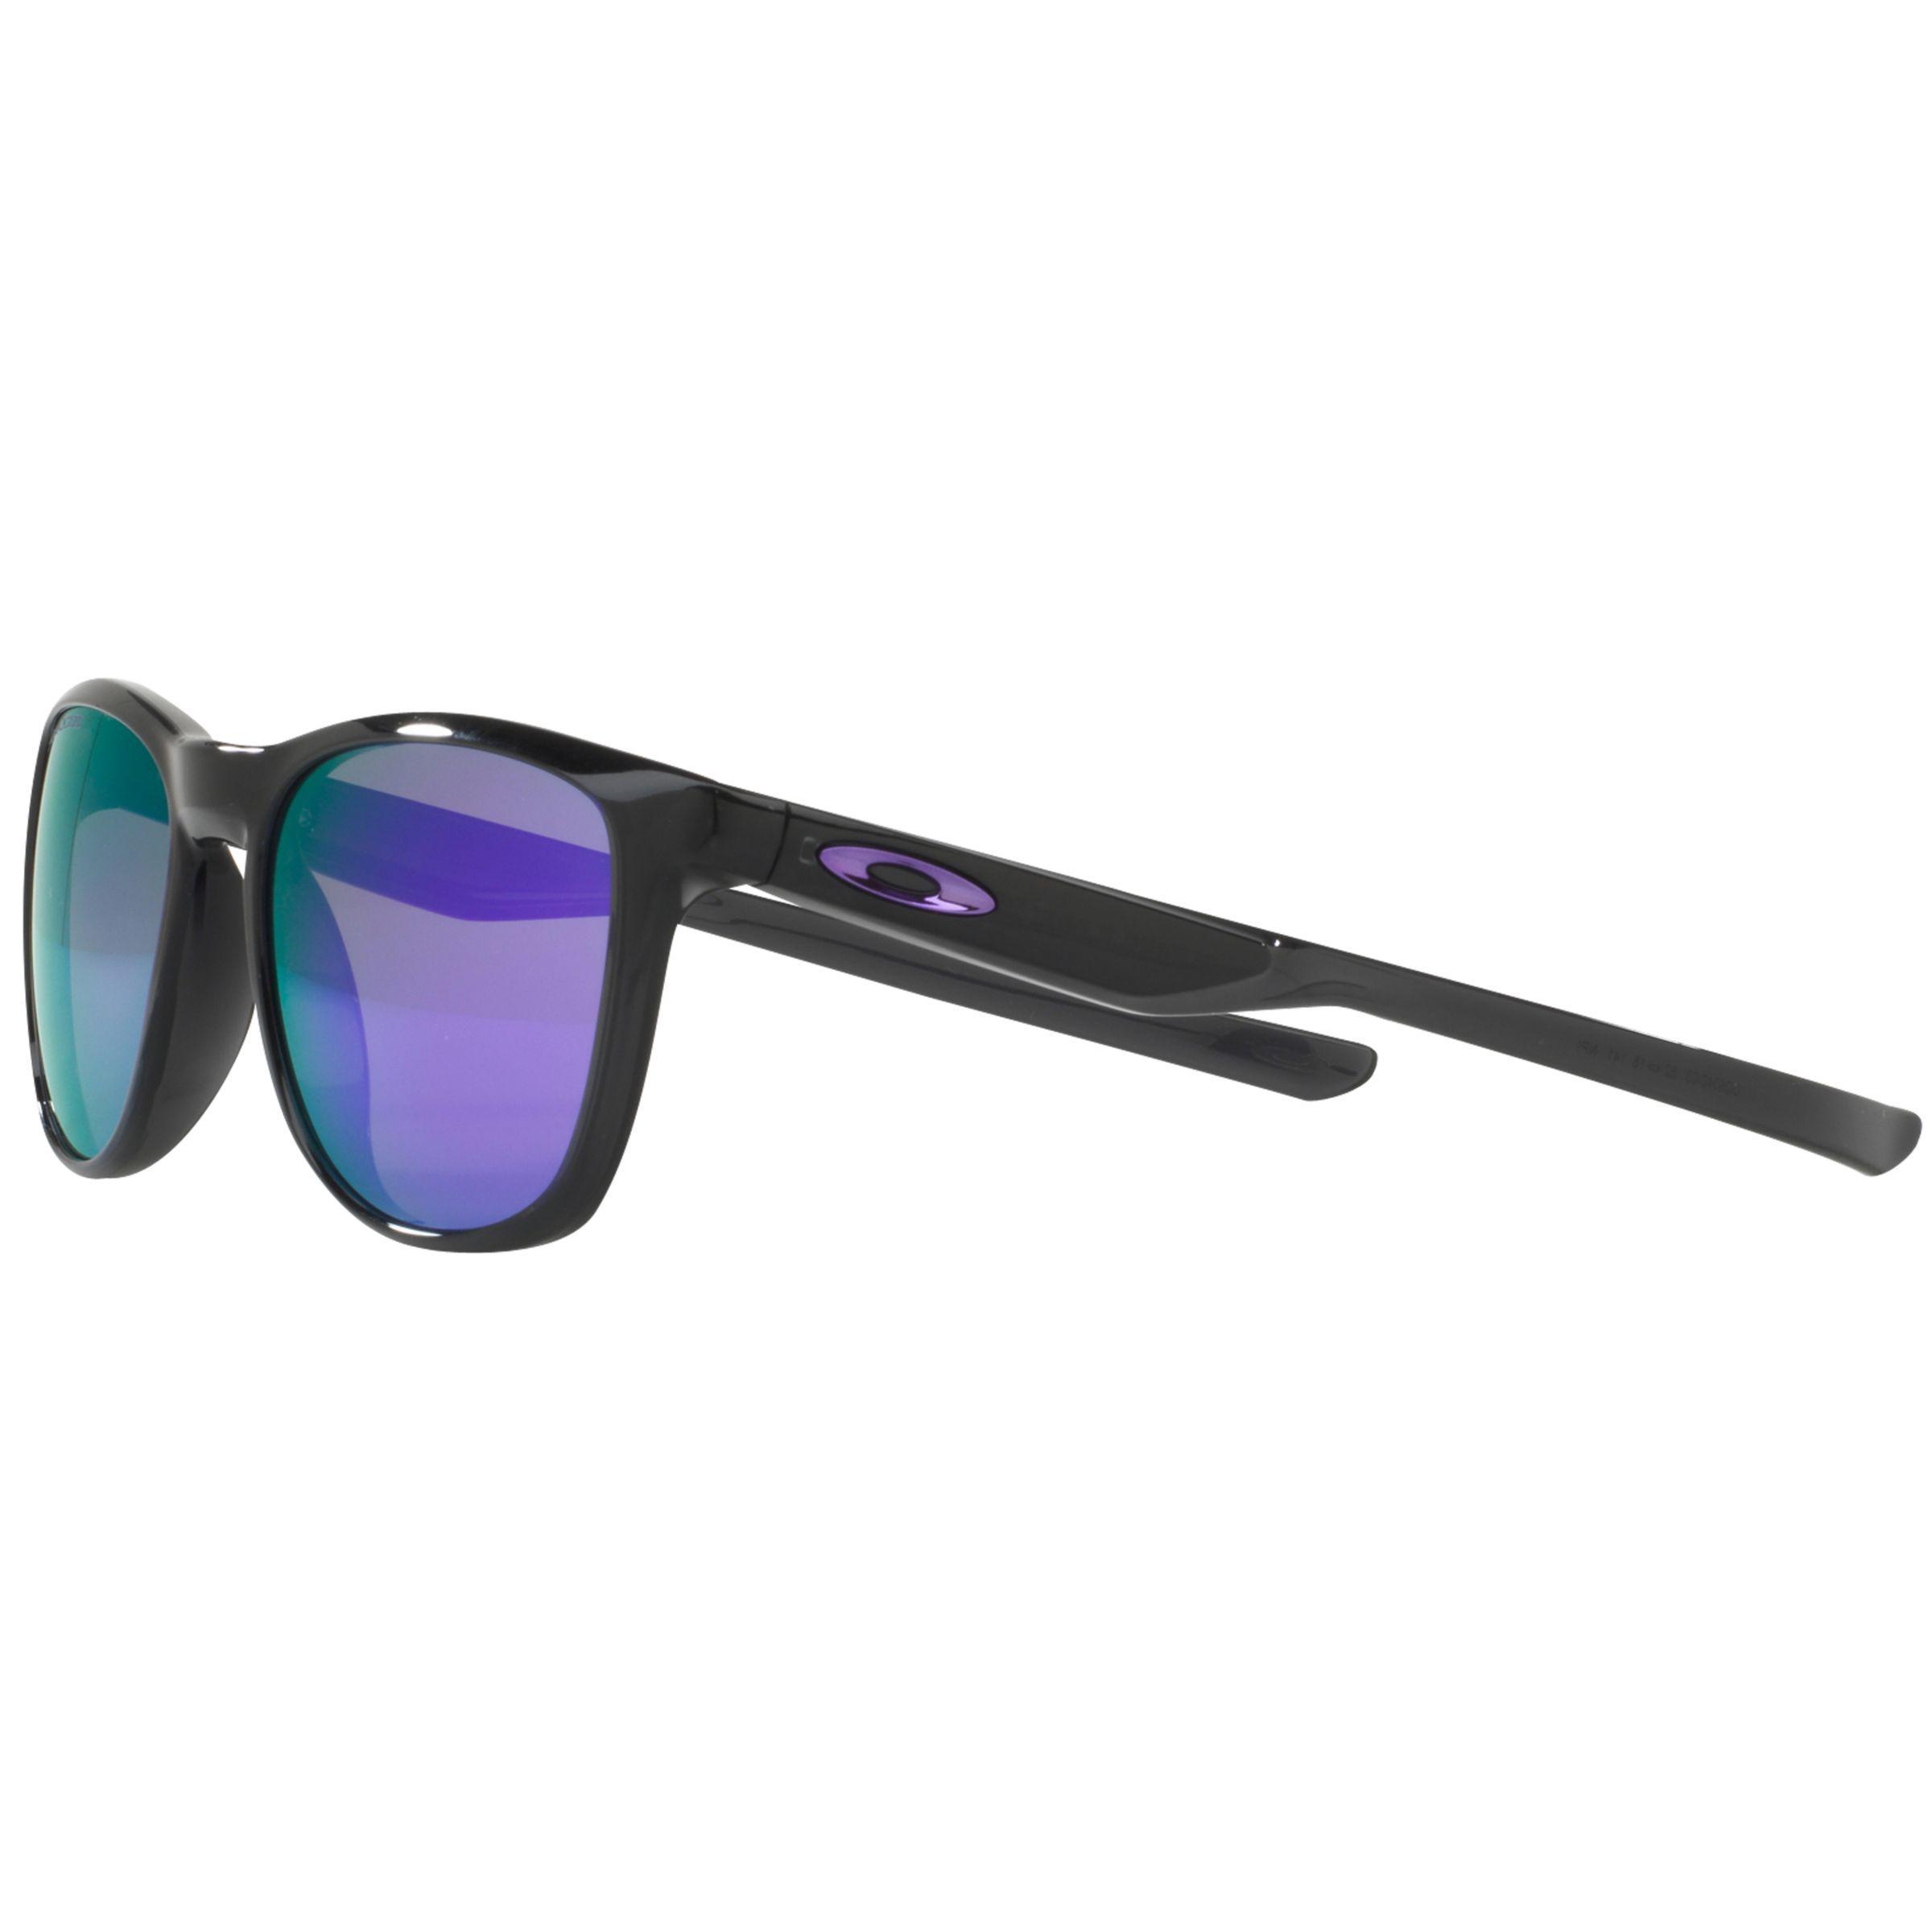 a2d994ce26 Oakley - Multicolor Oo9340 Trillbe X Polarised Square Sunglasses for Men -  Lyst. View fullscreen